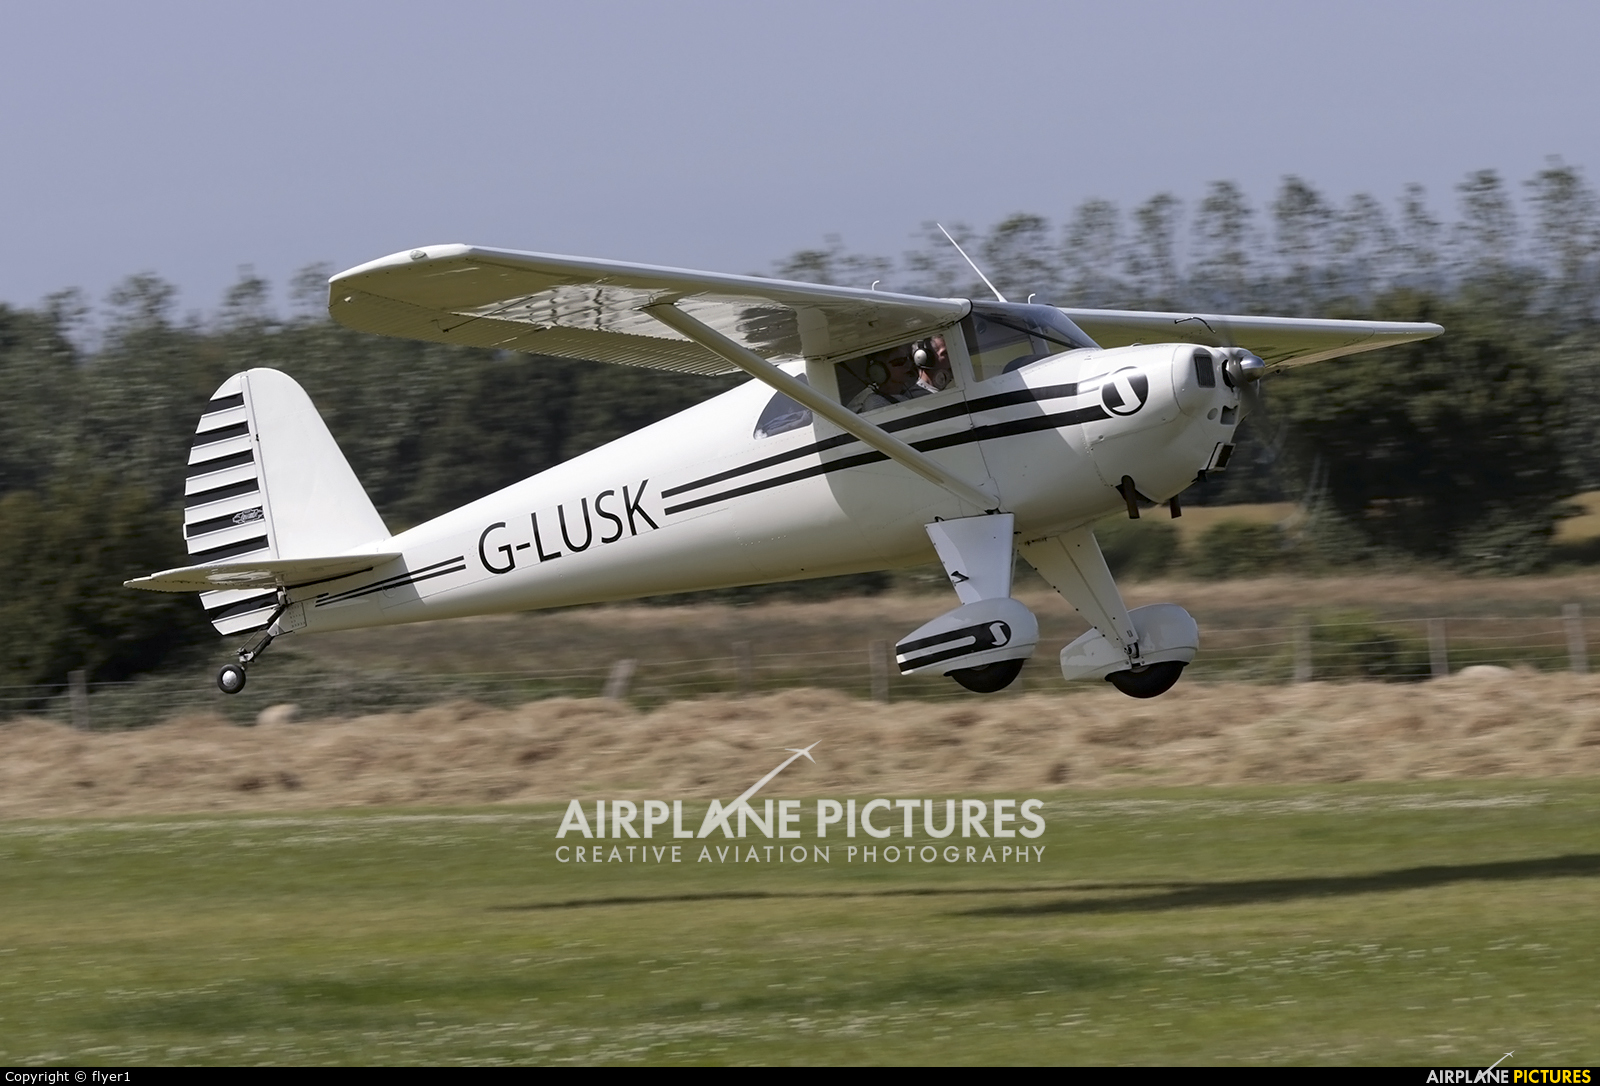 Private G-LUSK aircraft at Lashenden / Headcorn